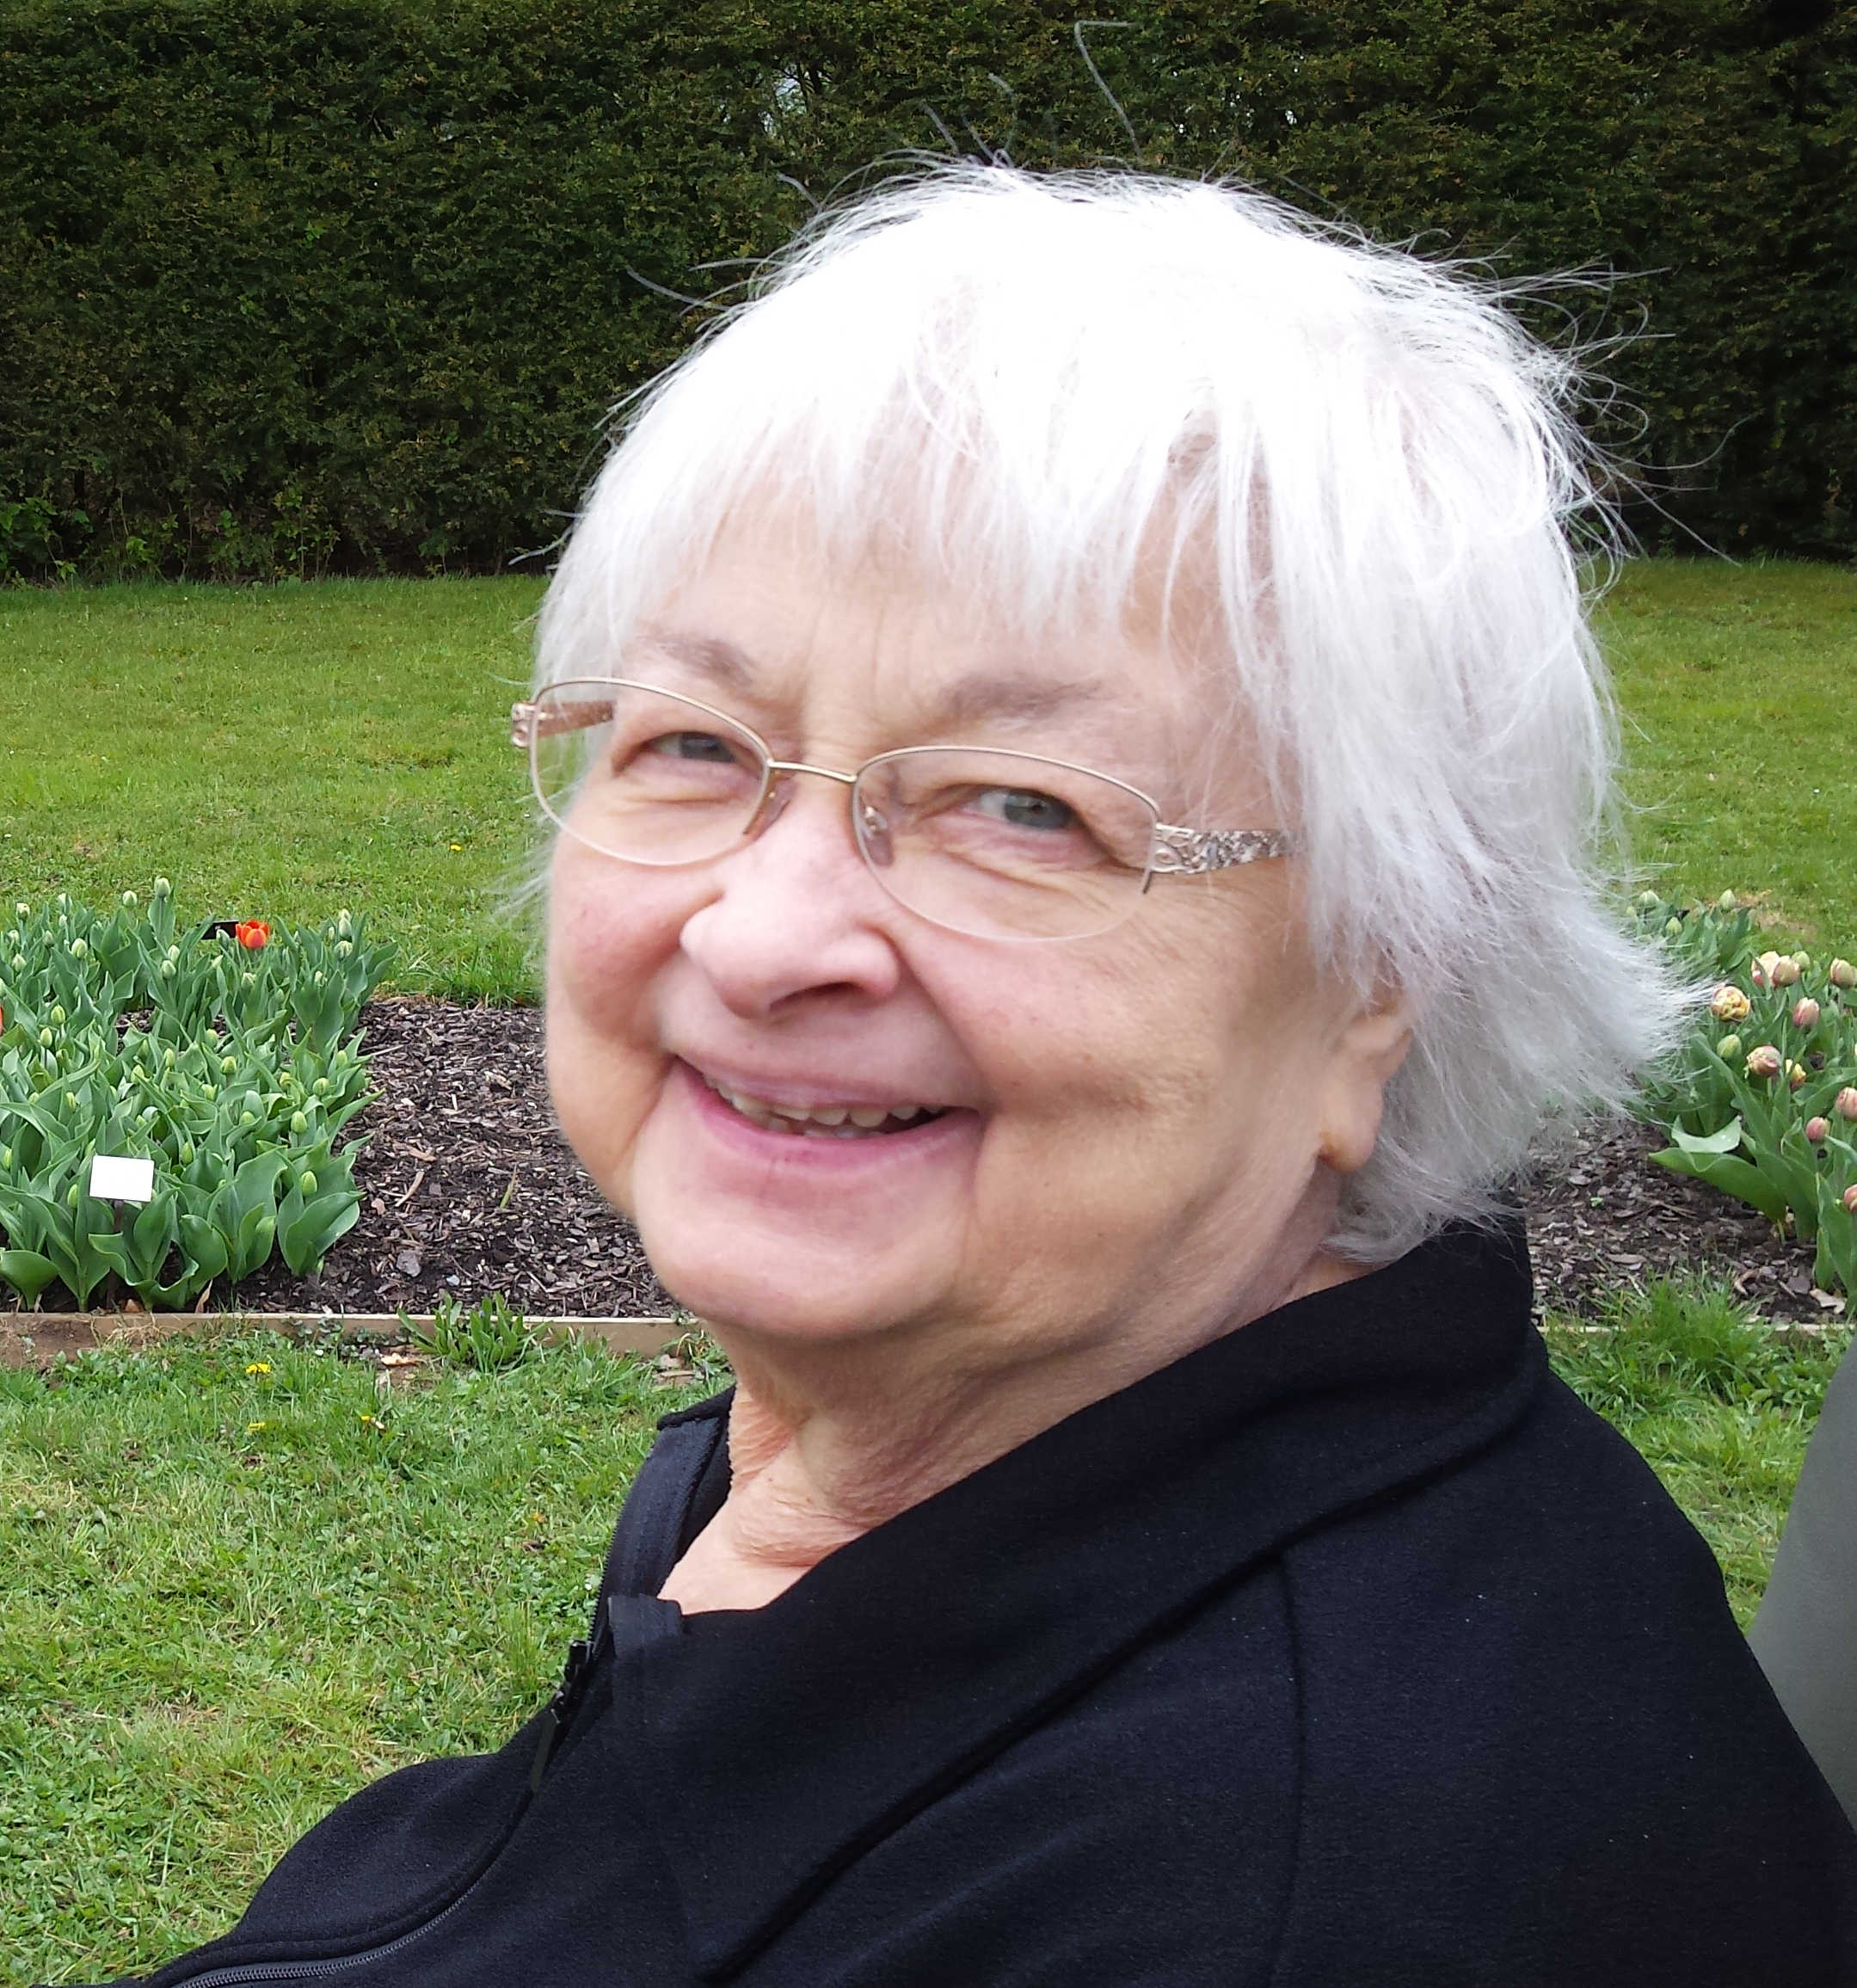 Dra. Kay M. Baker